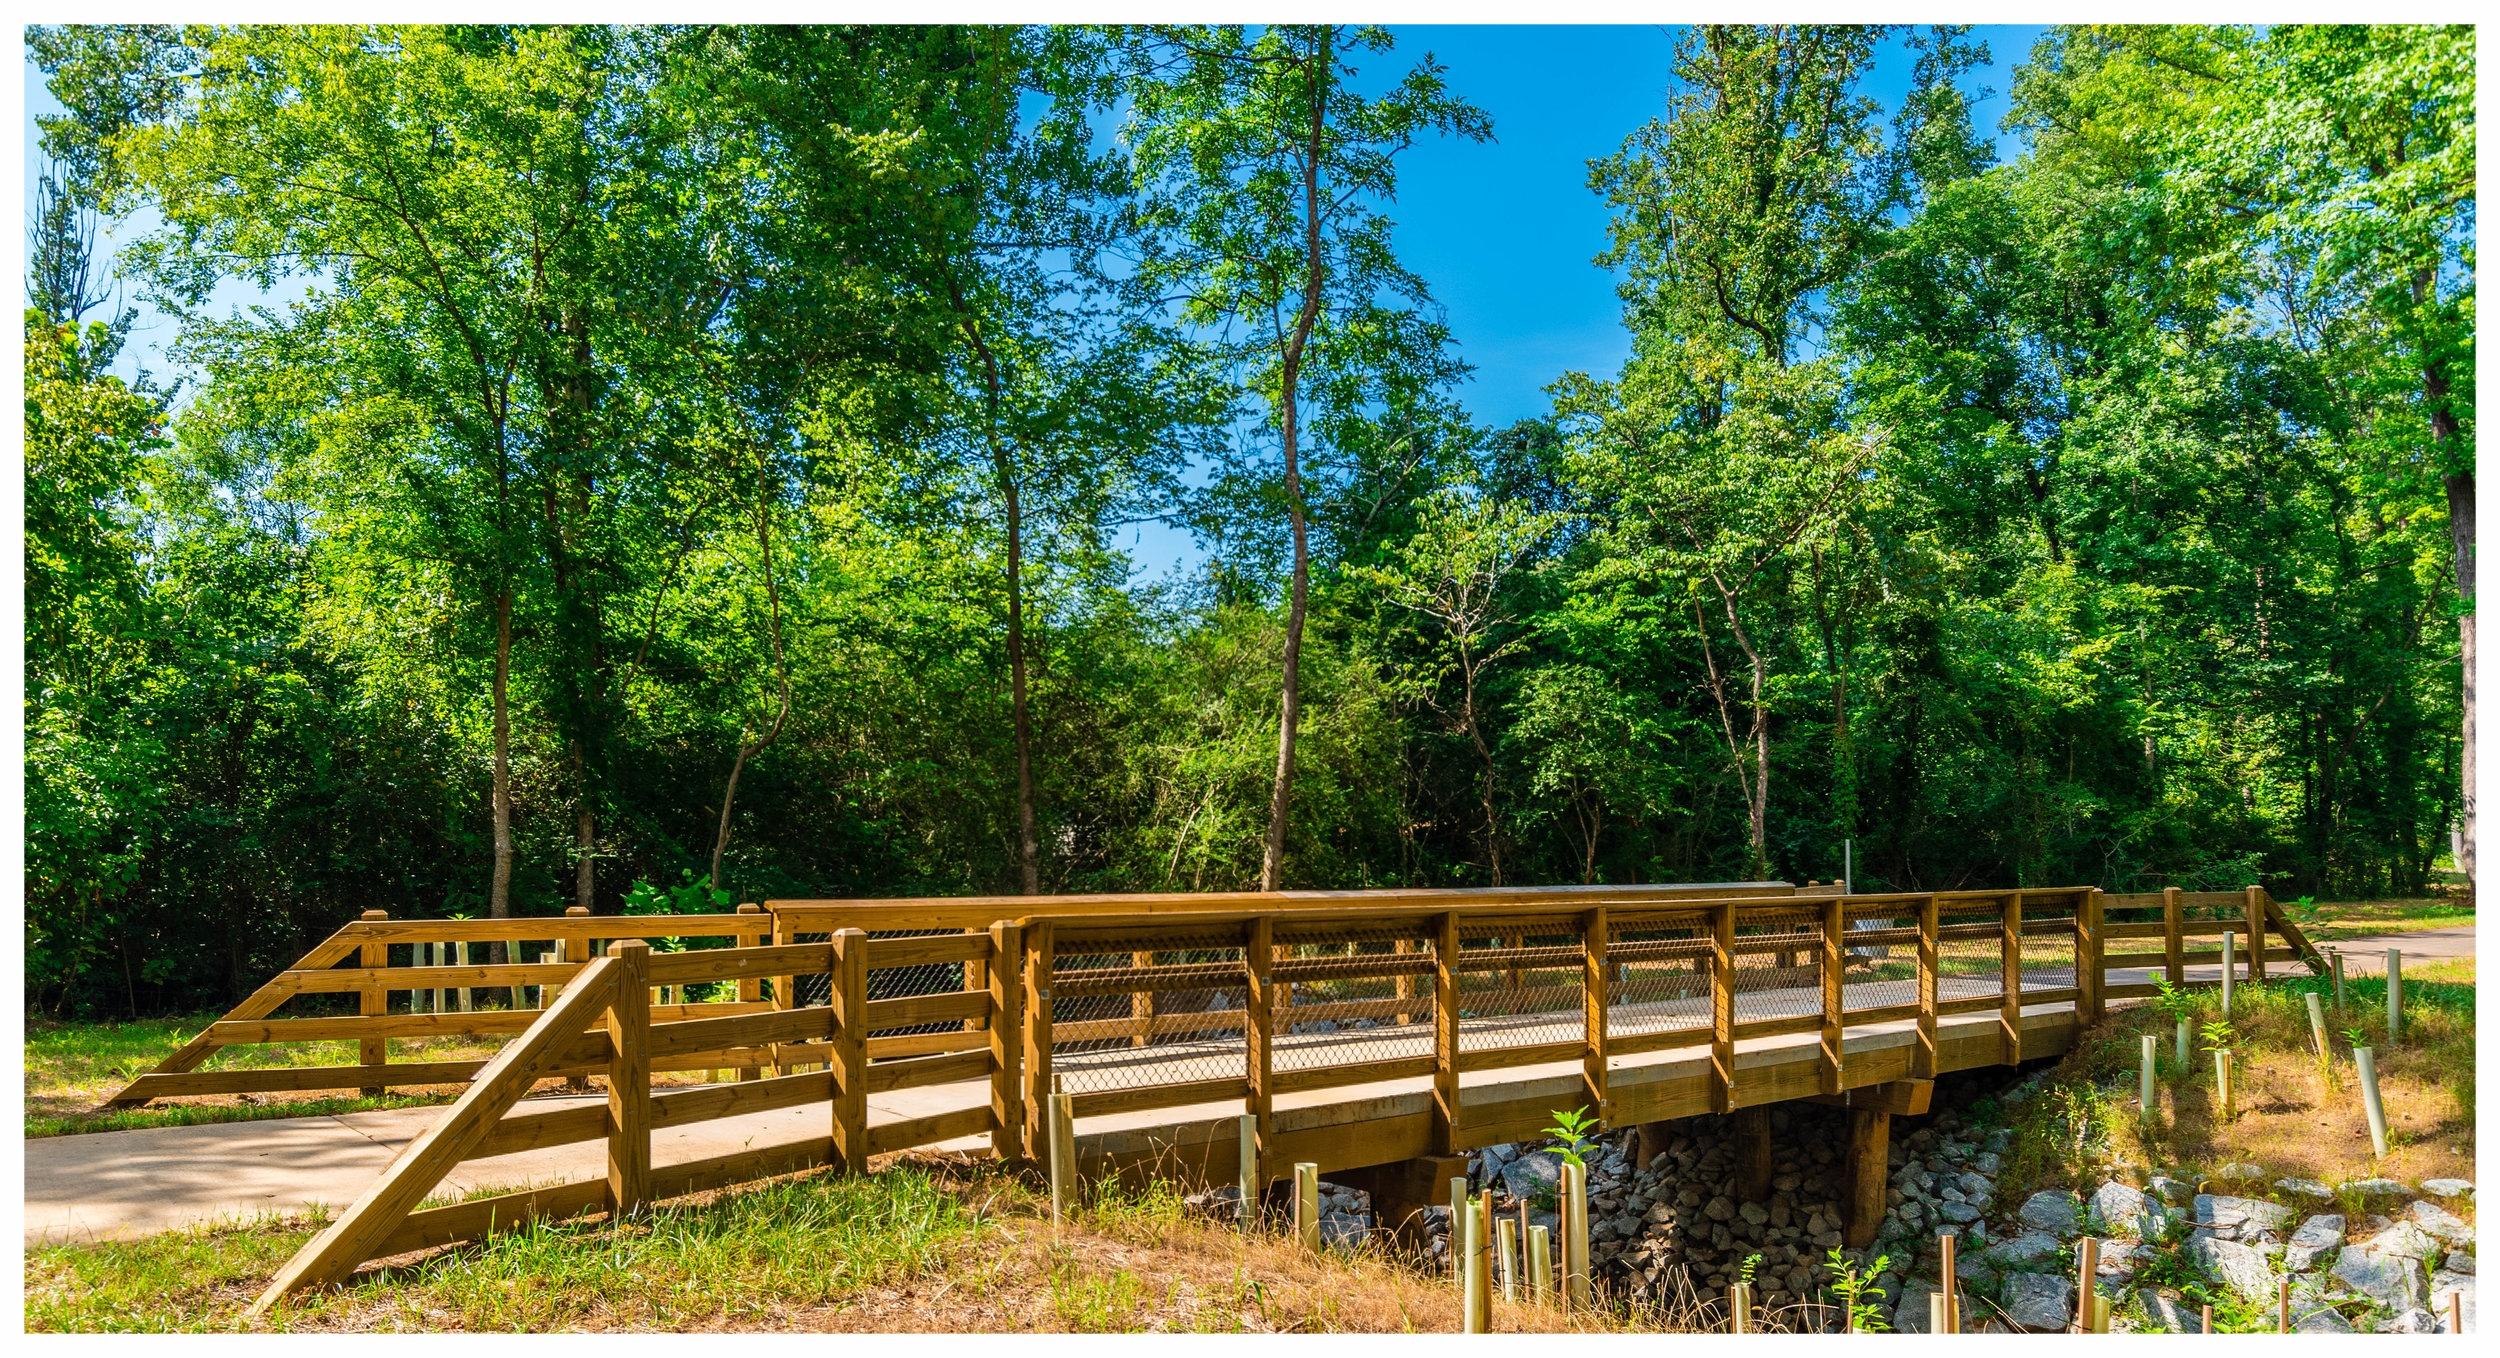 Wooden Bridge Construction